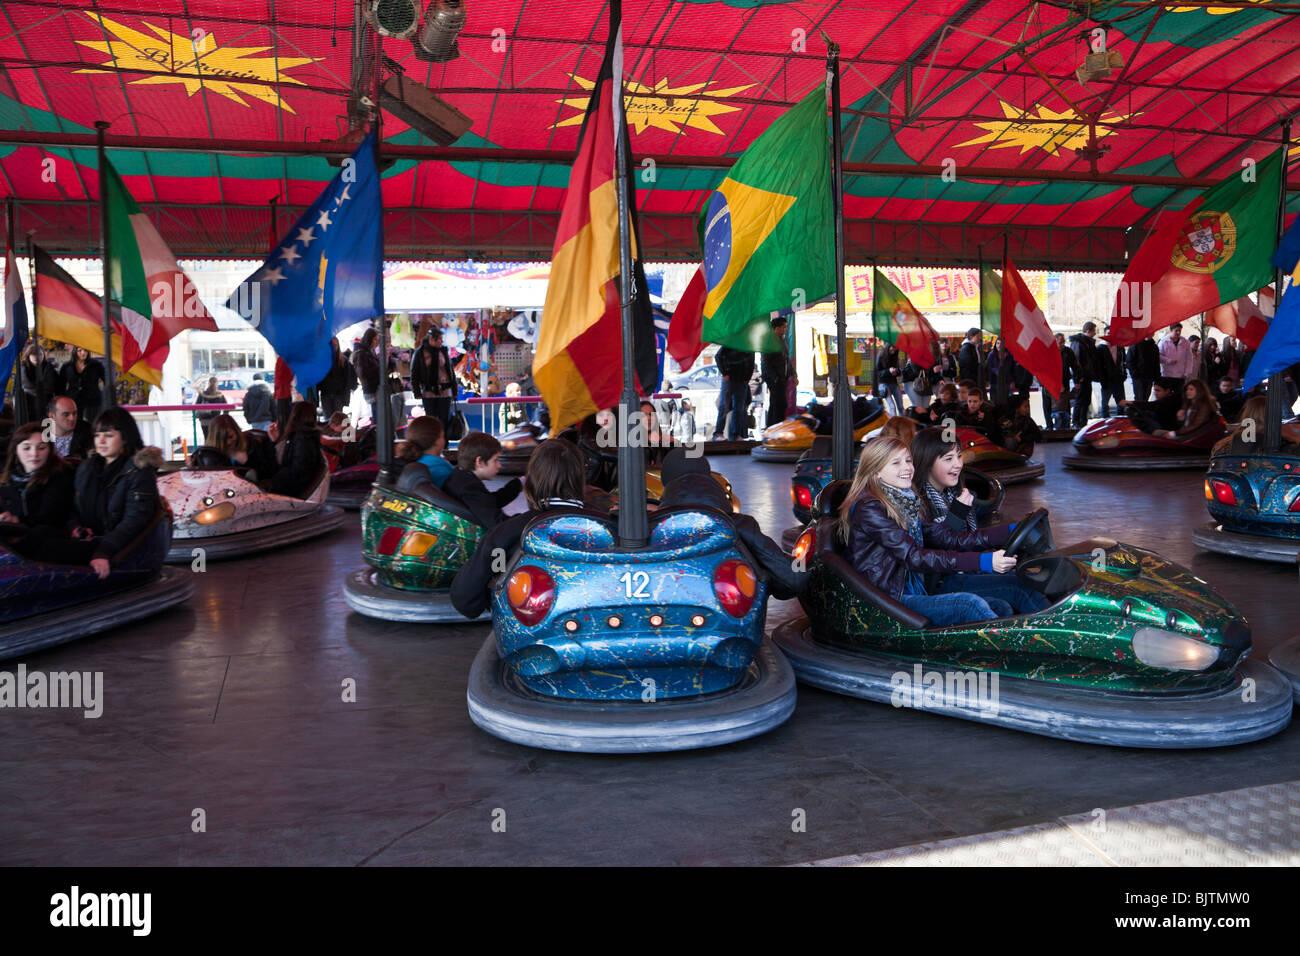 Teenagers Having Fun On A Bumper Car Ride, Dodgem Cars